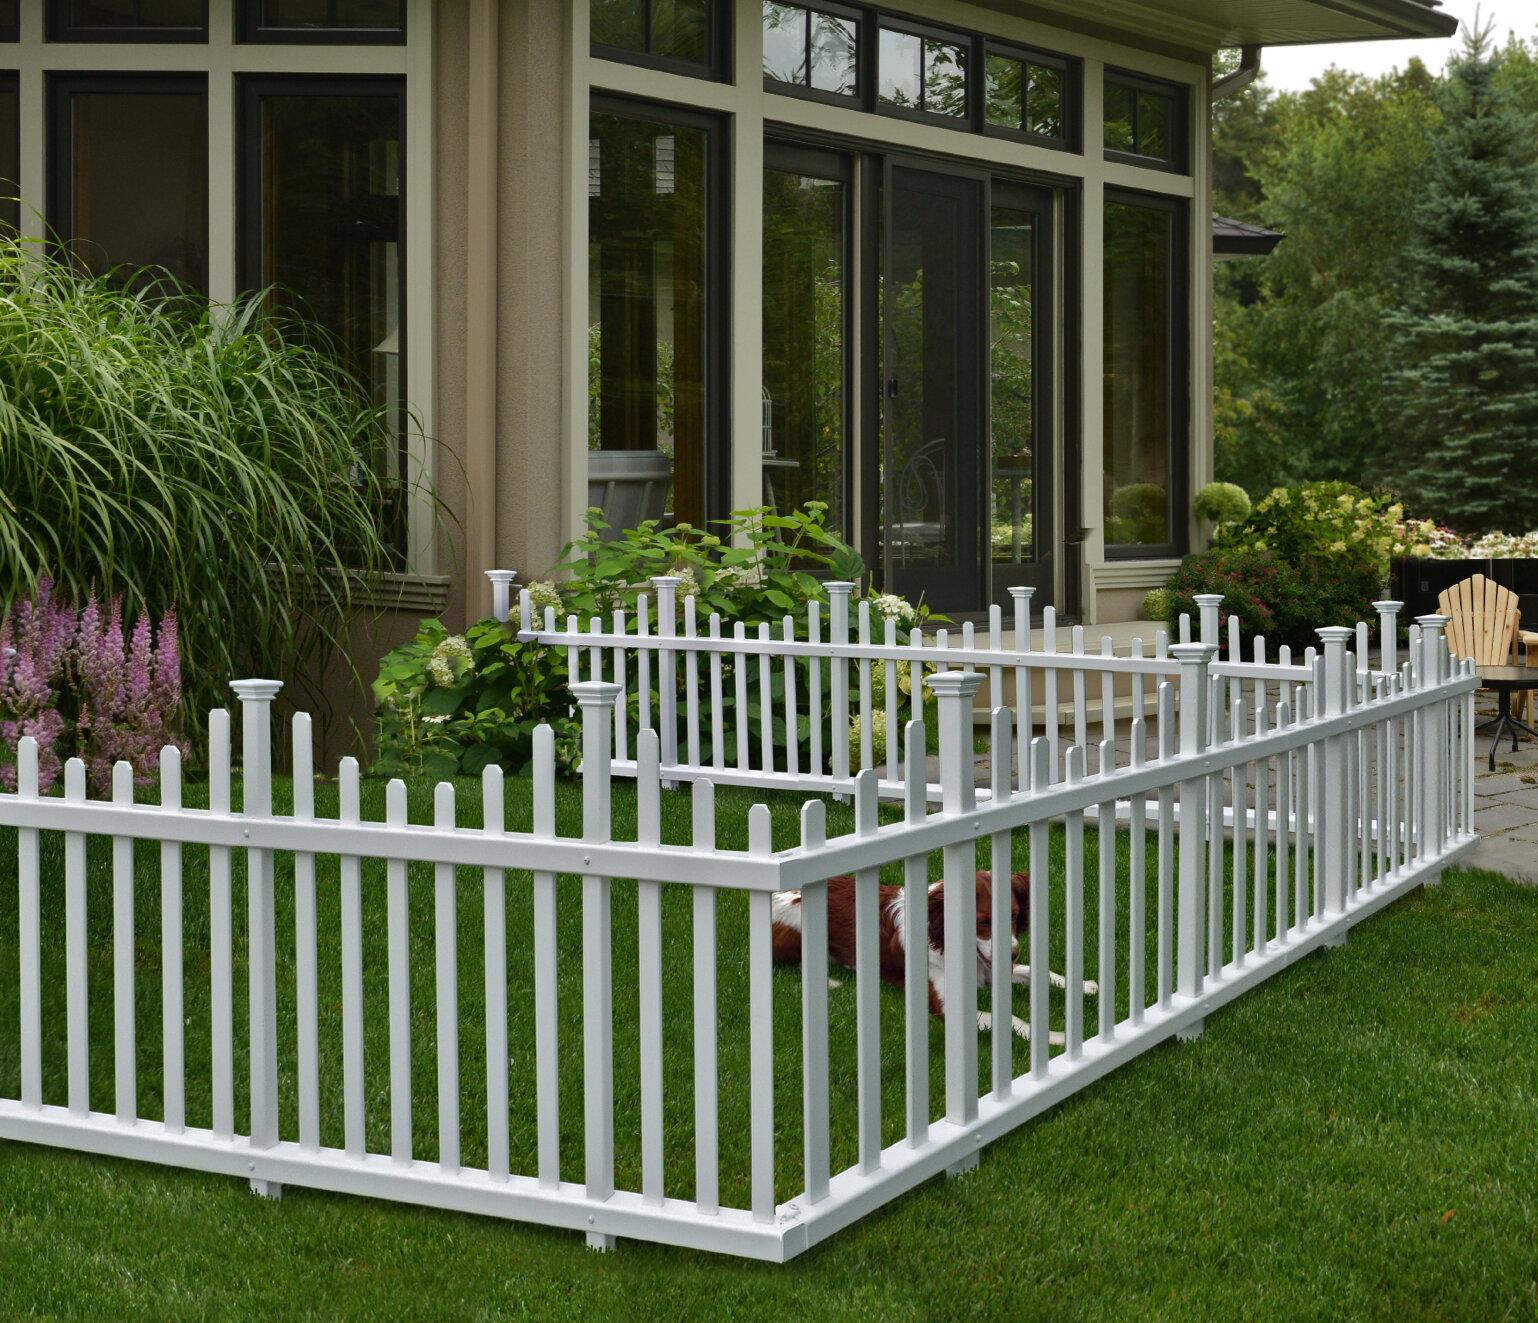 vinyl picket fence front yard. Madison No Dig Vinyl Picket Garden Fence Panel (Set Of 2) Front Yard